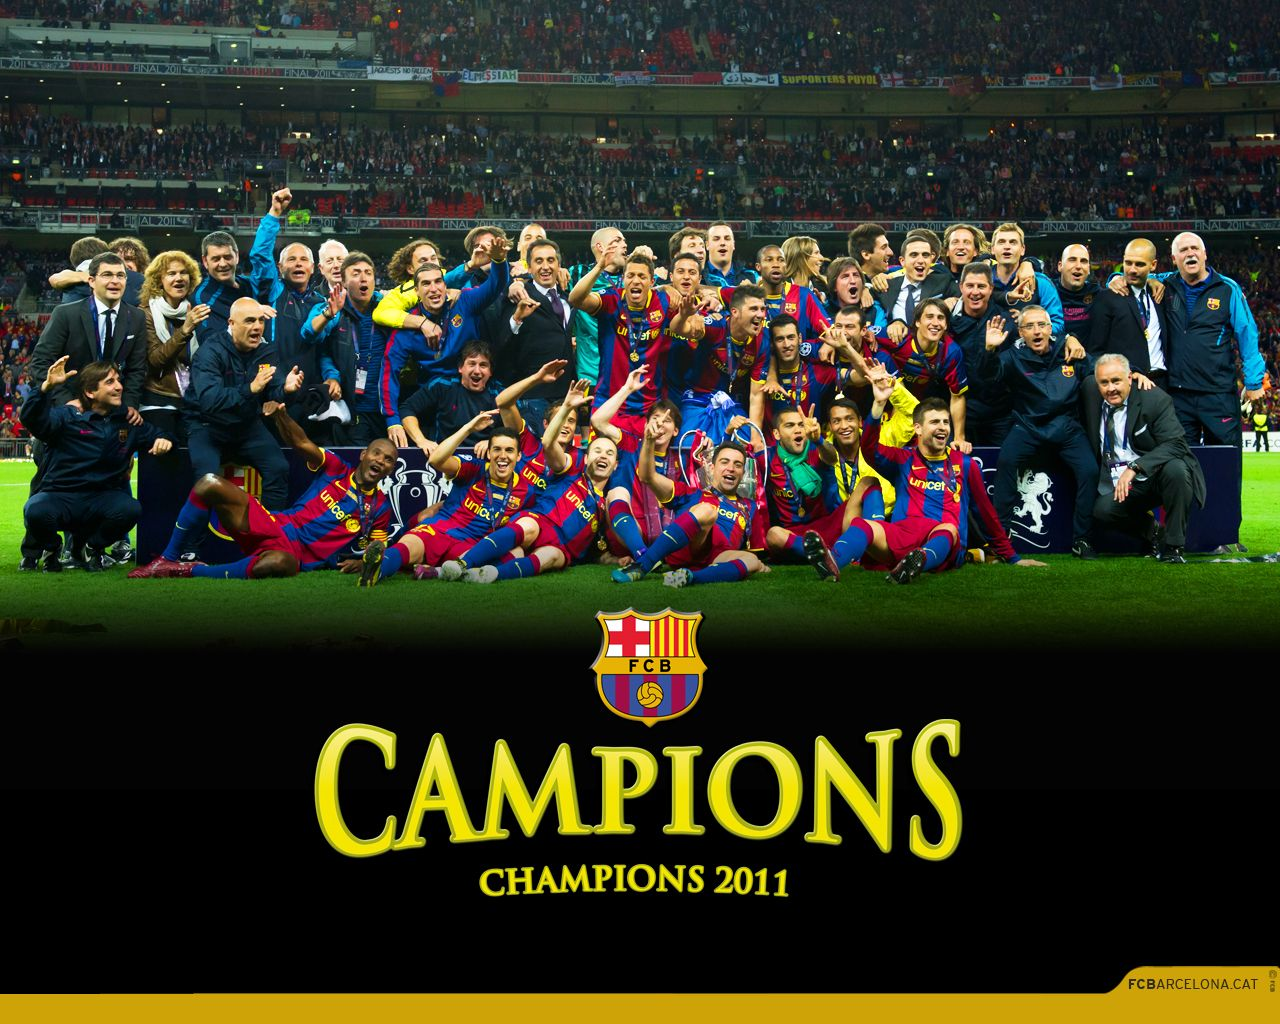 http://3.bp.blogspot.com/-Vw8X9MGOMYQ/Tu950tyv9_I/AAAAAAAADtY/UNs_wjEnibY/s1600/fc-barcelona-champions-league-winner--wallpaper-.jpg